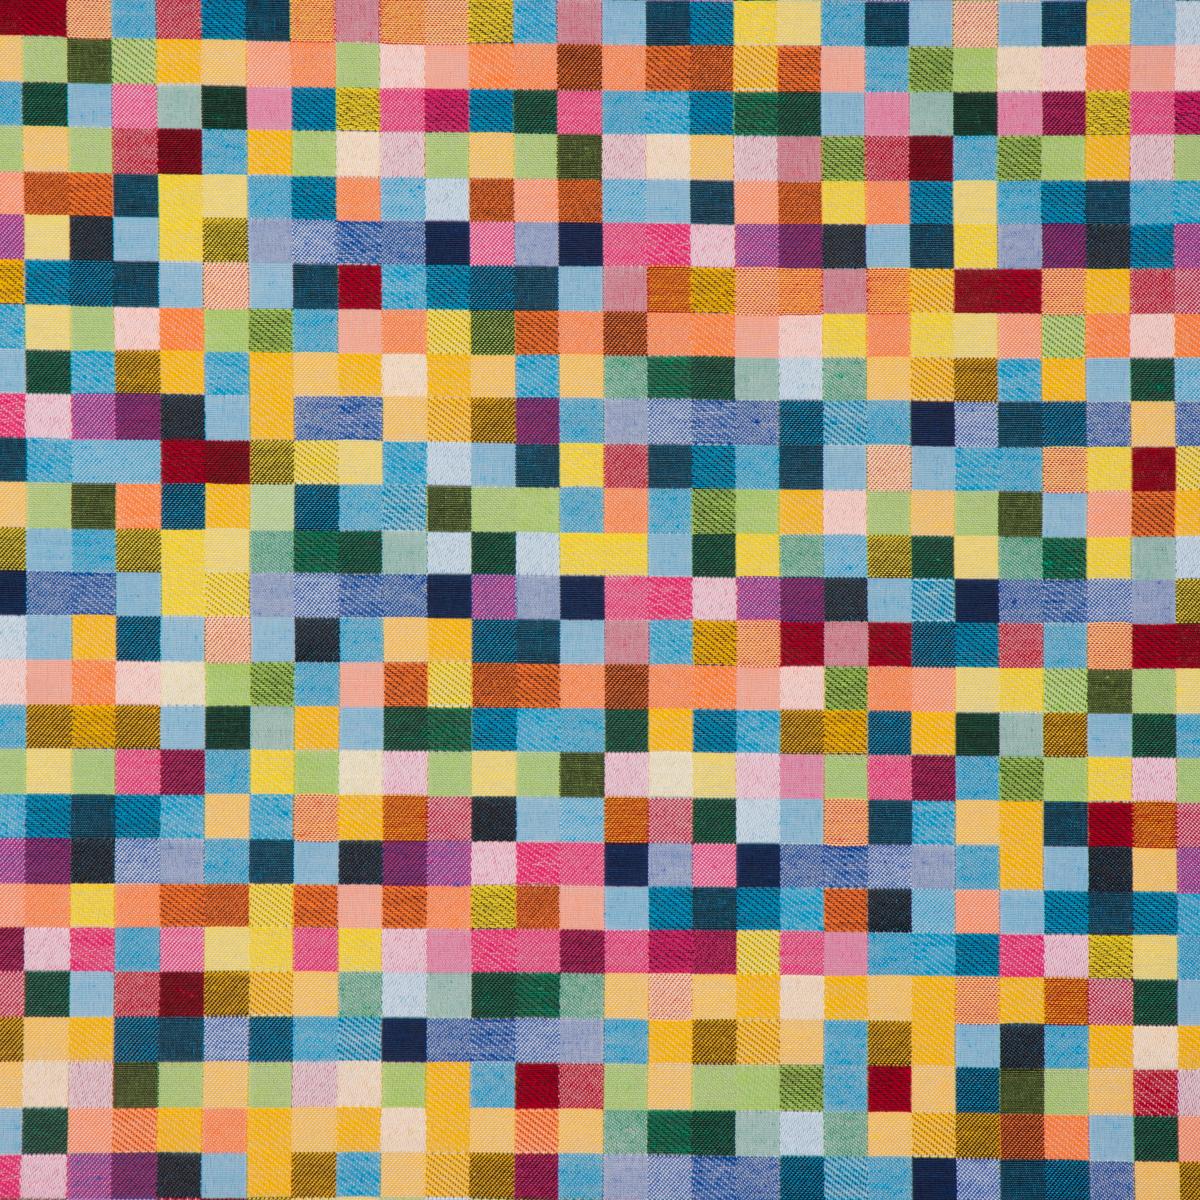 Dekostoff Doubleface Wendestoff Jacquard Kästchen Pixel bunt 1,4m Breite